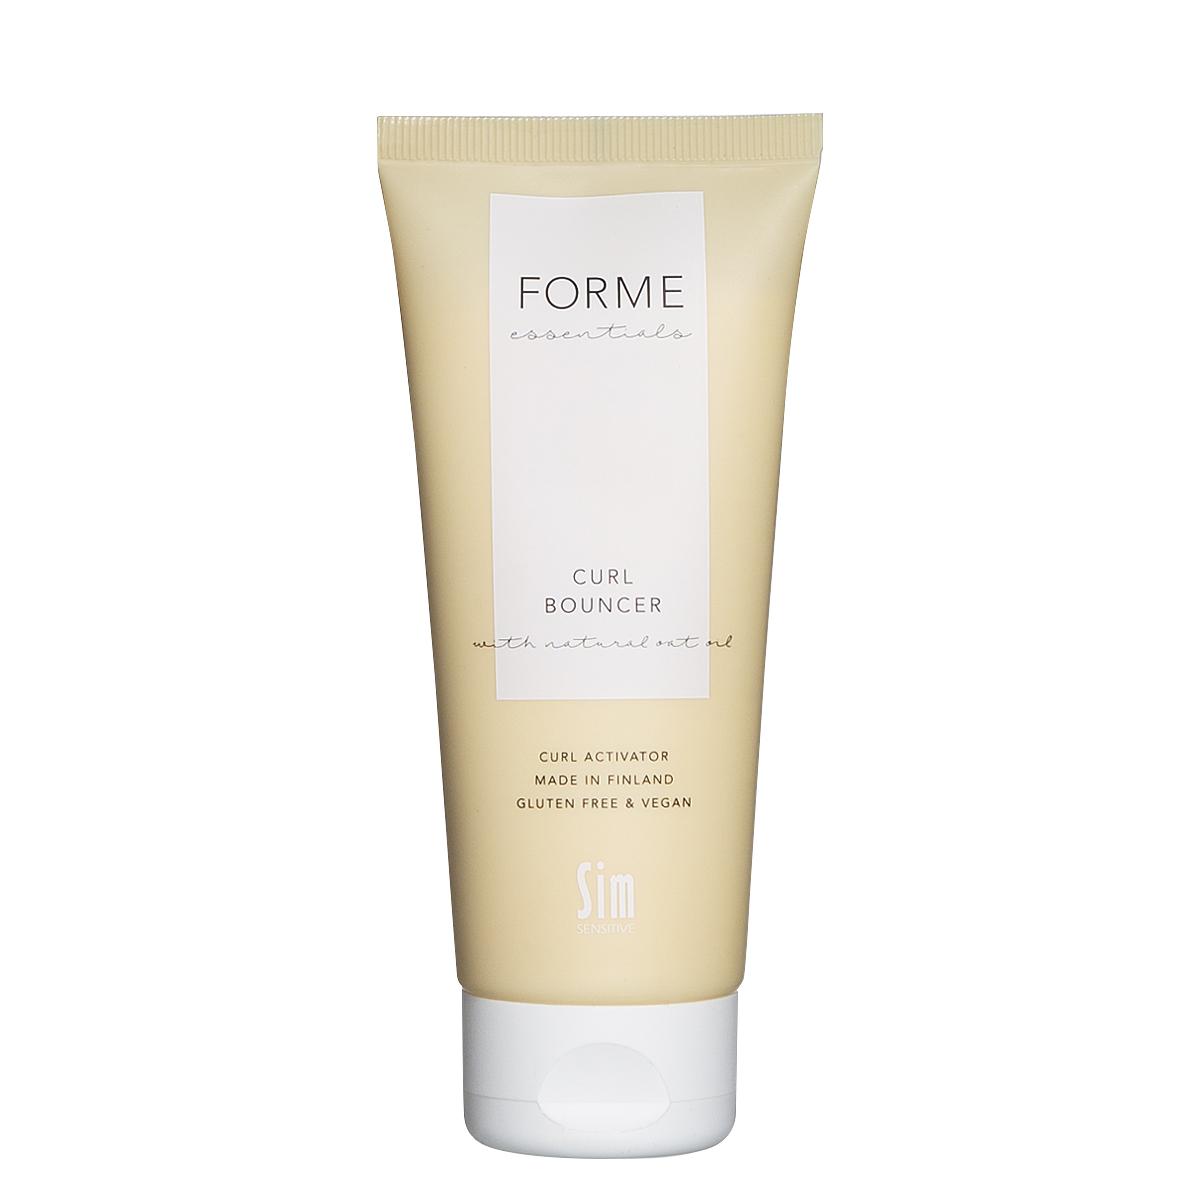 FORME Essentials Forme Curl Bouncer крем для вьющихся волос 100 мл (FORME Essentials, Curl Bouncer)